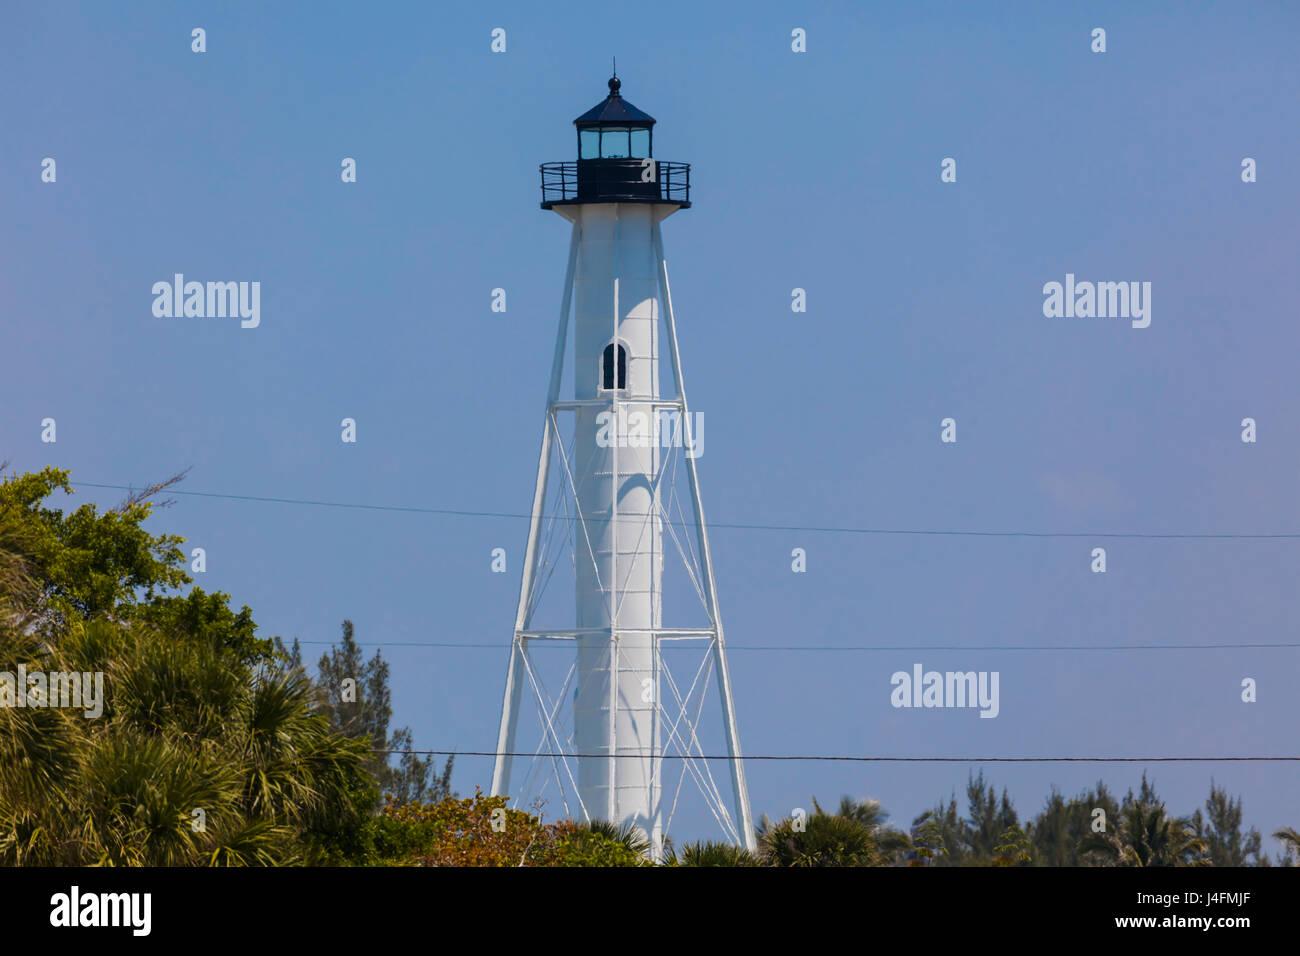 Rangelight in Gasparilla Island State Park on the Gulf of Mexico on Gasparilla Island Florida Stock Photo